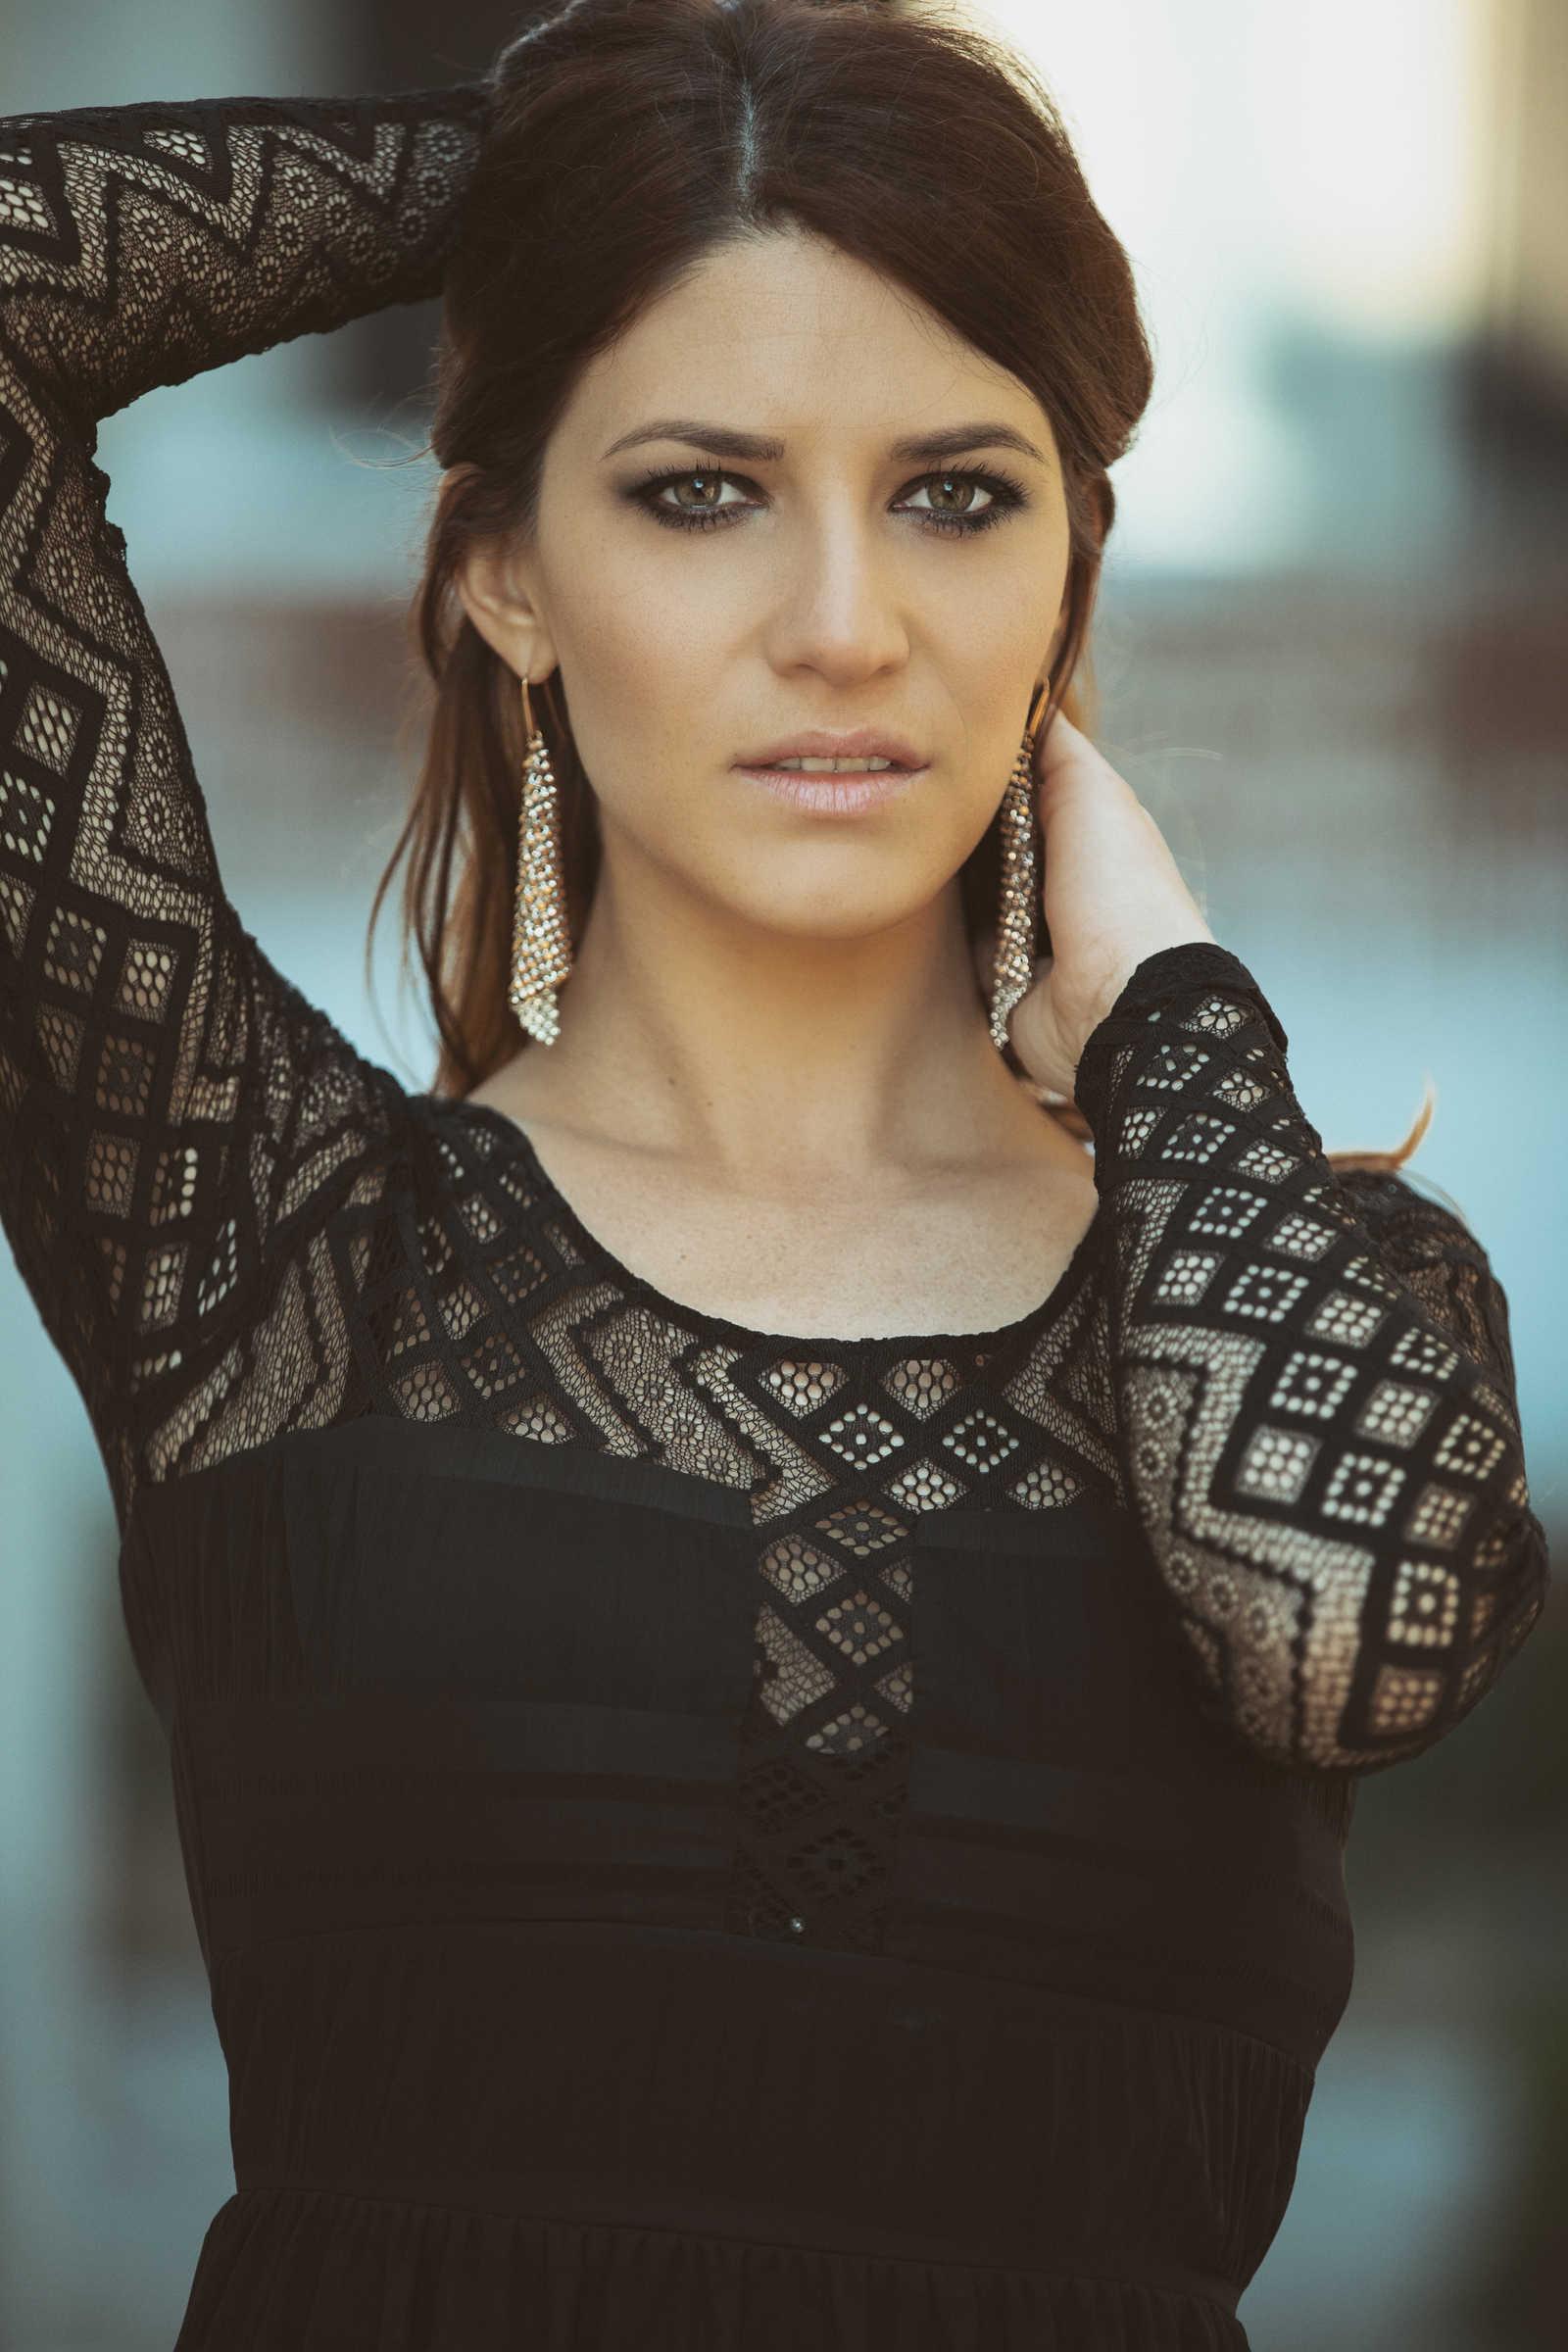 Claudia Vismara